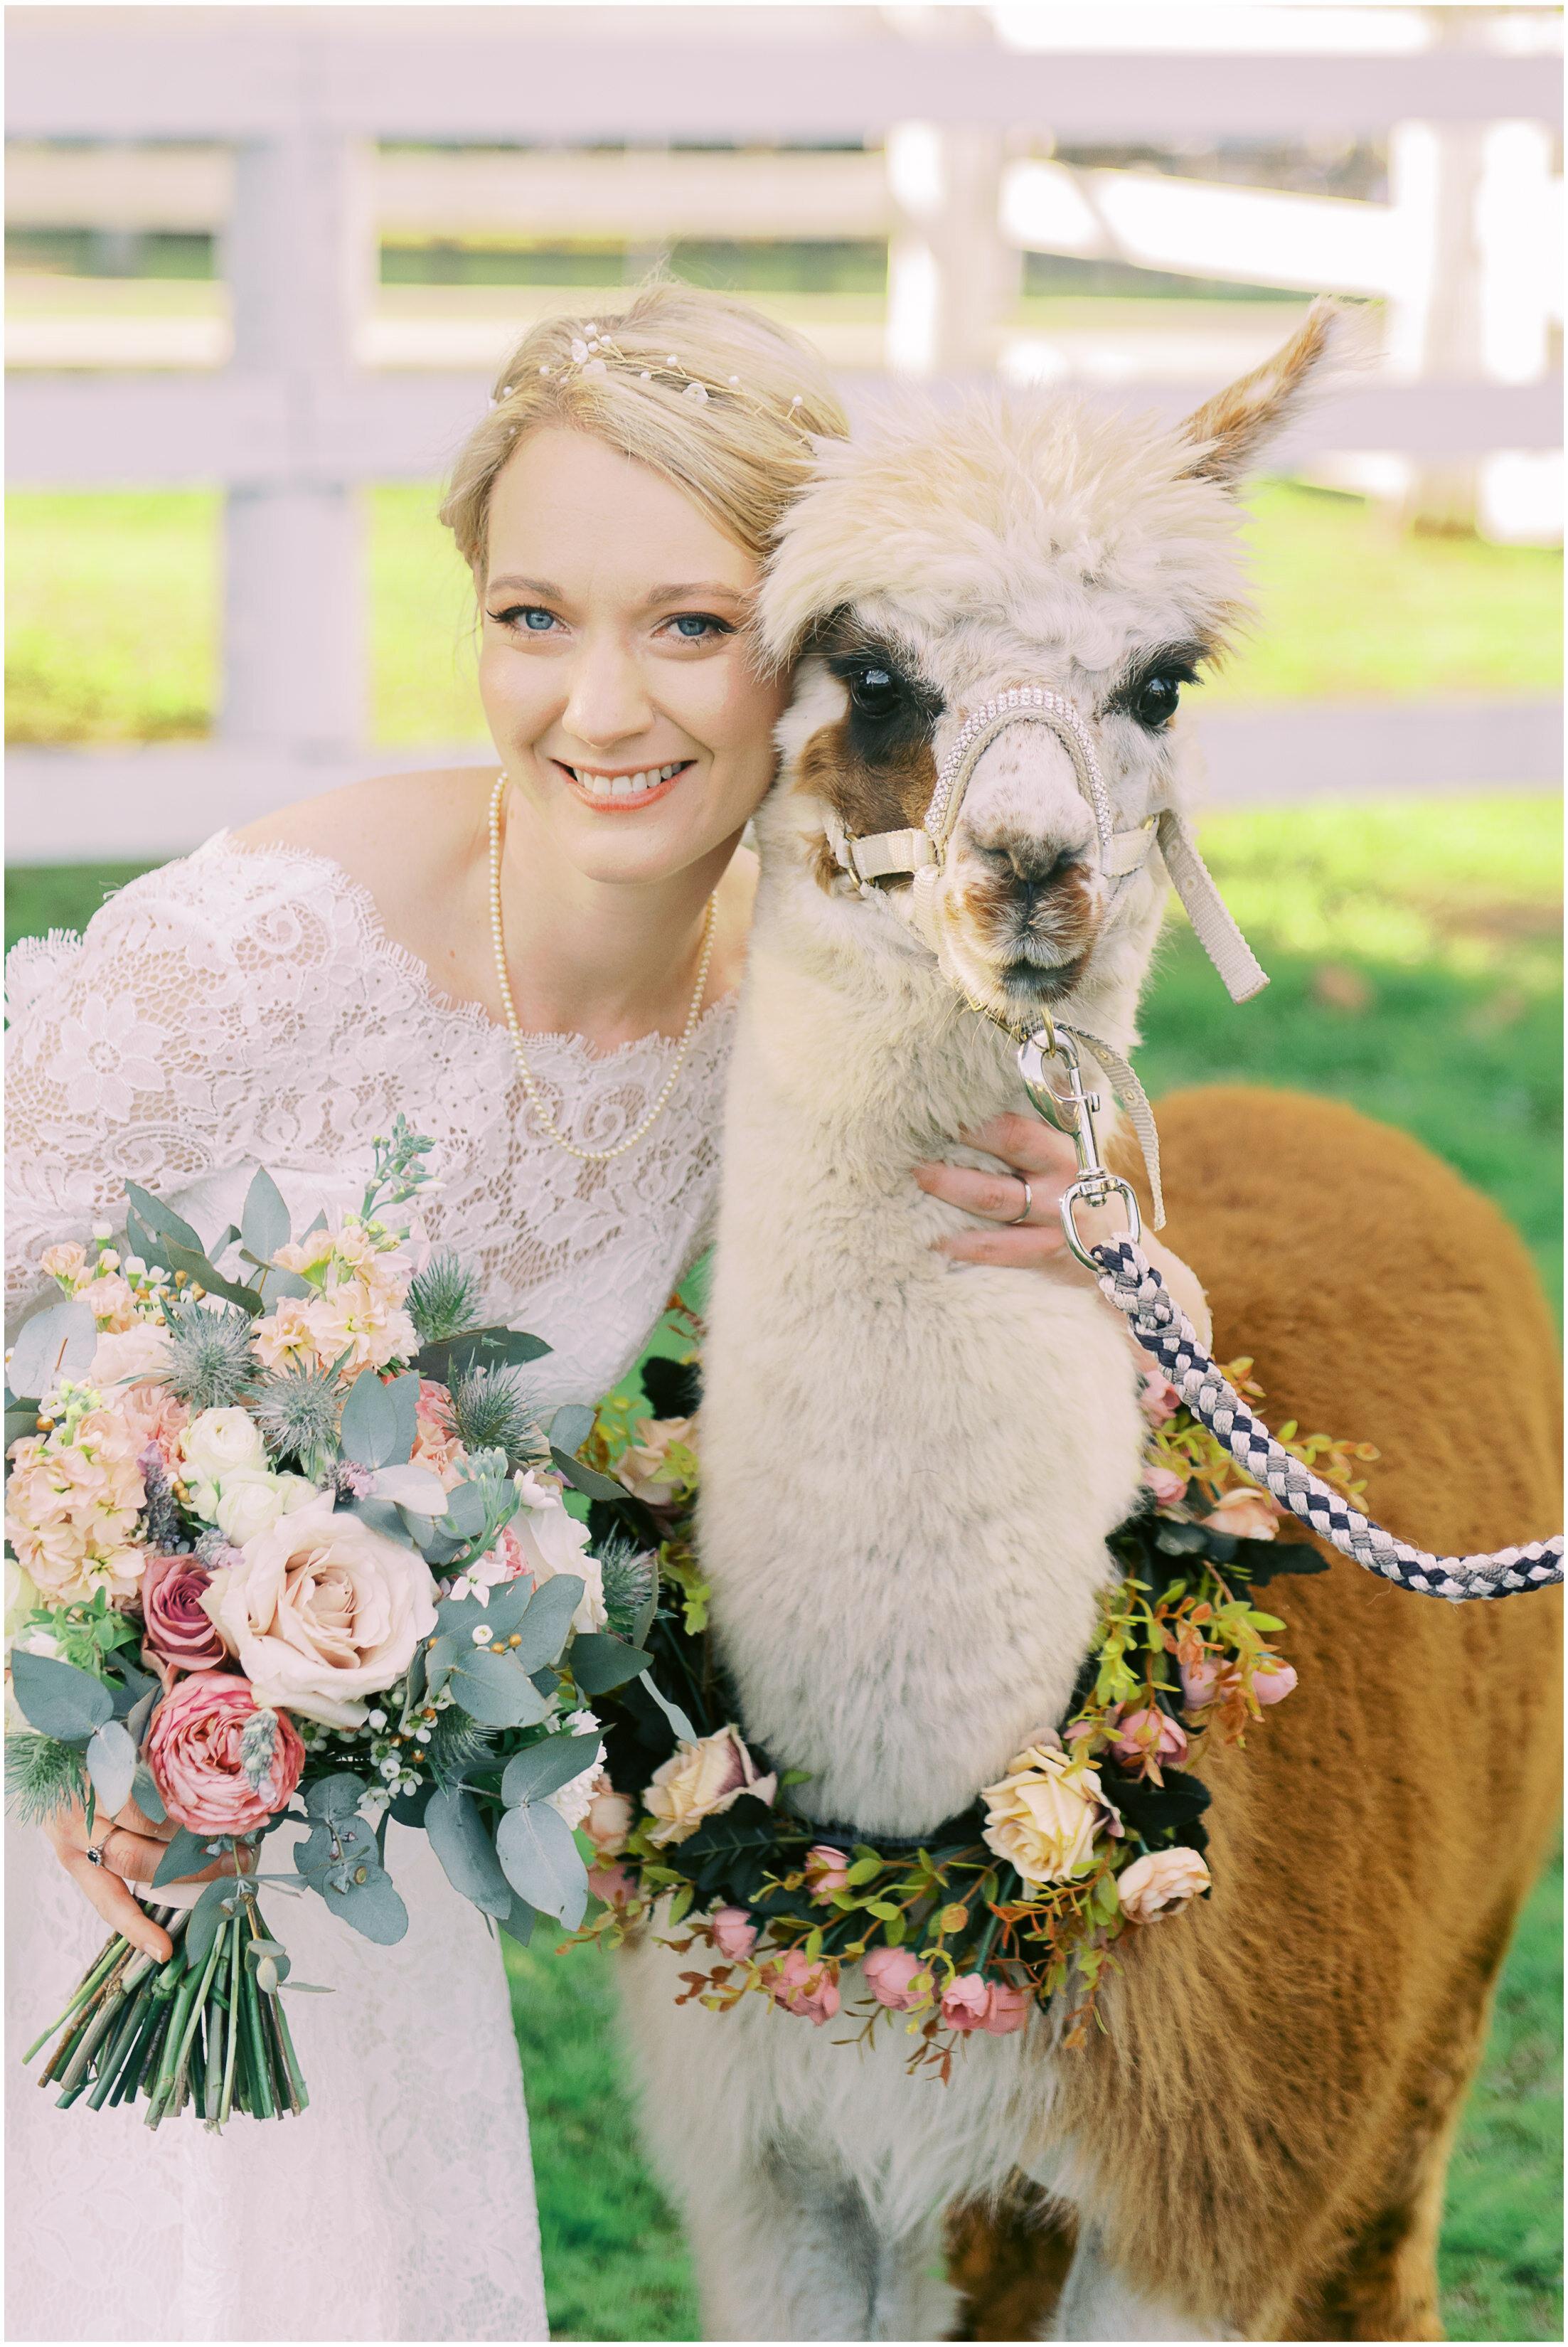 brisbane-fine-art-wedding-photographer-lauren-olivia-luxury-wedding-australia-17.jpg